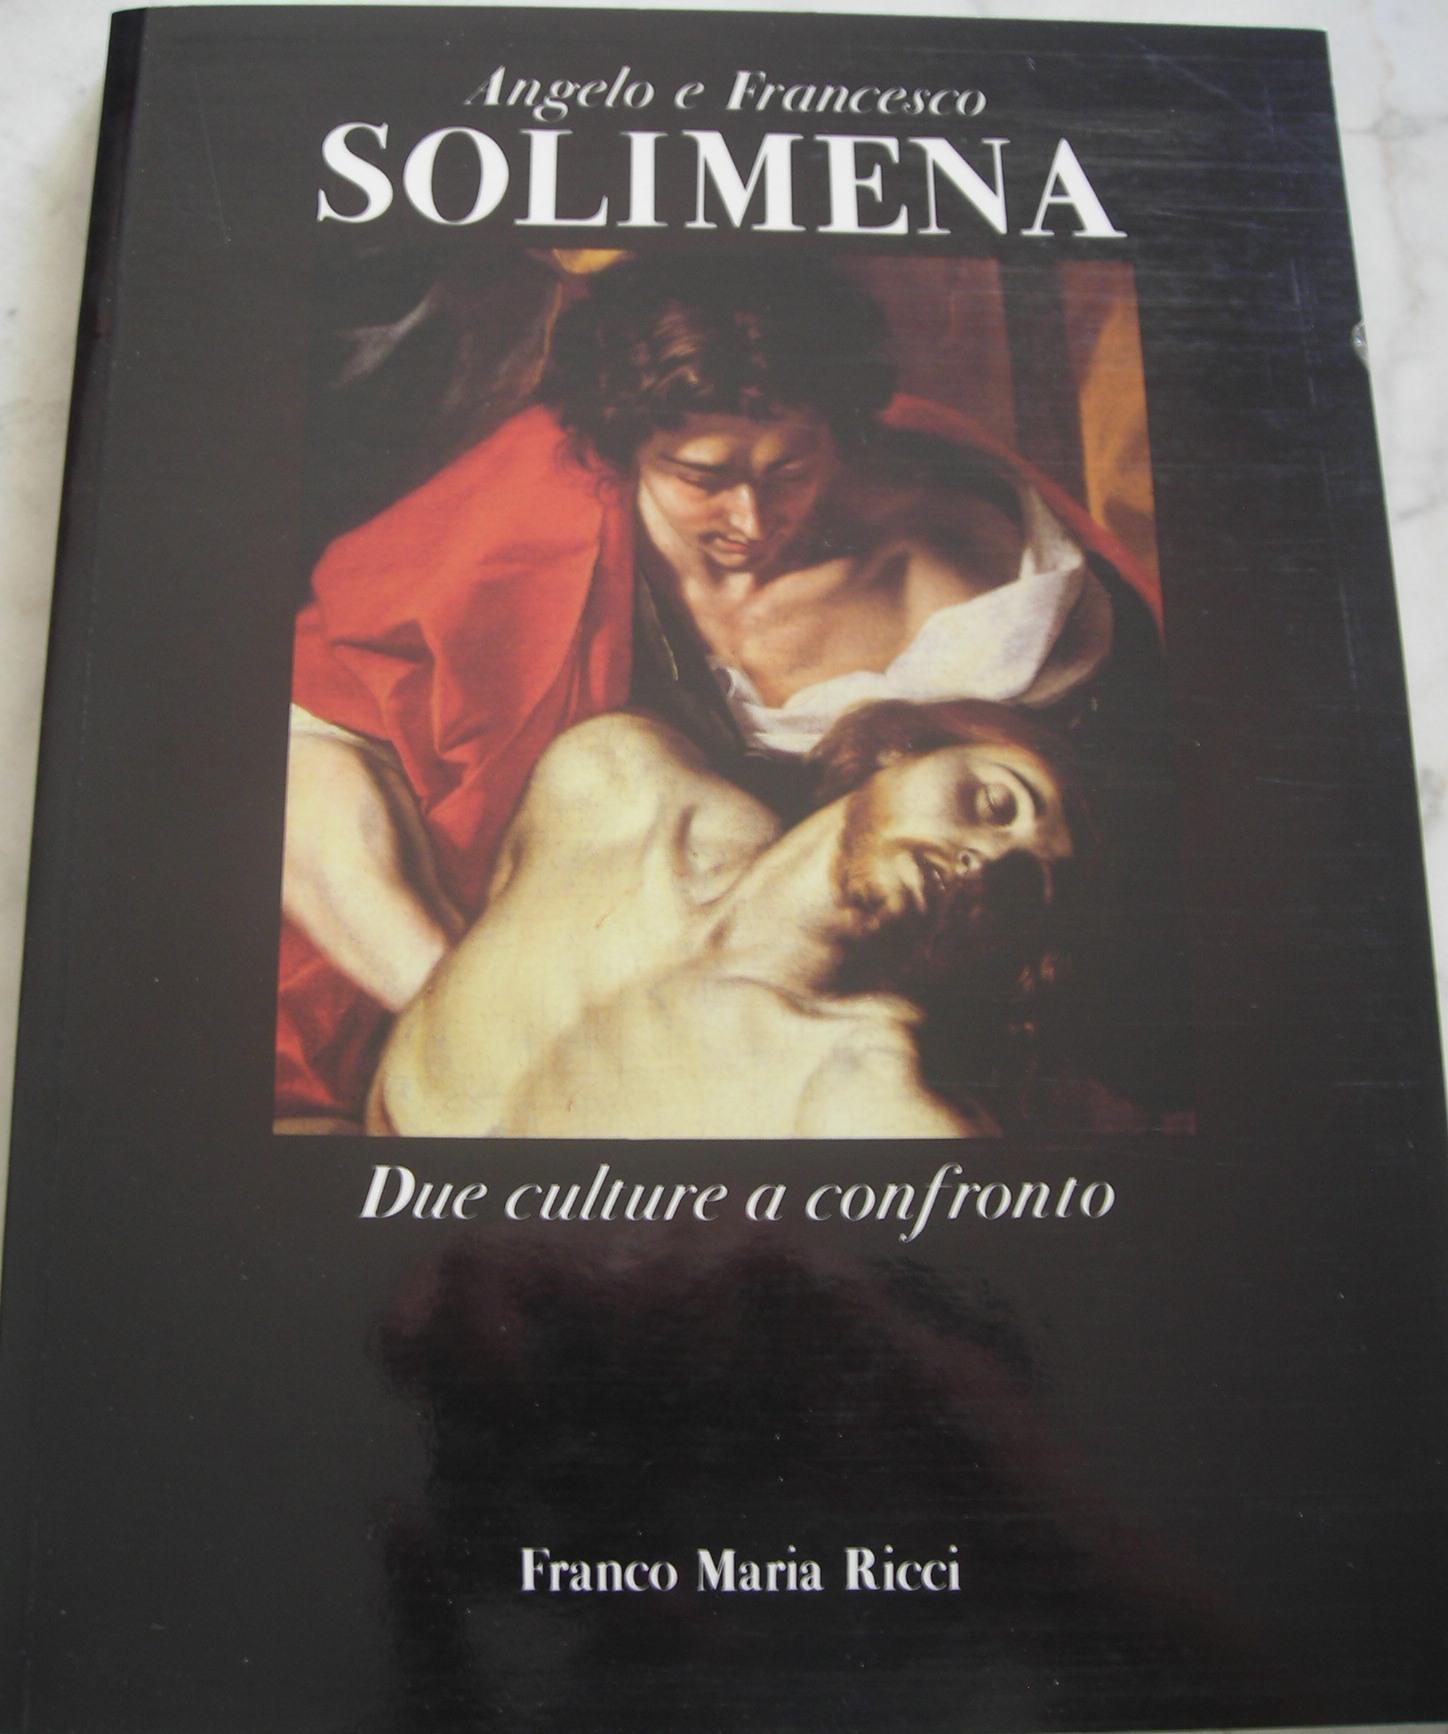 Angelo e Francesco Solimena